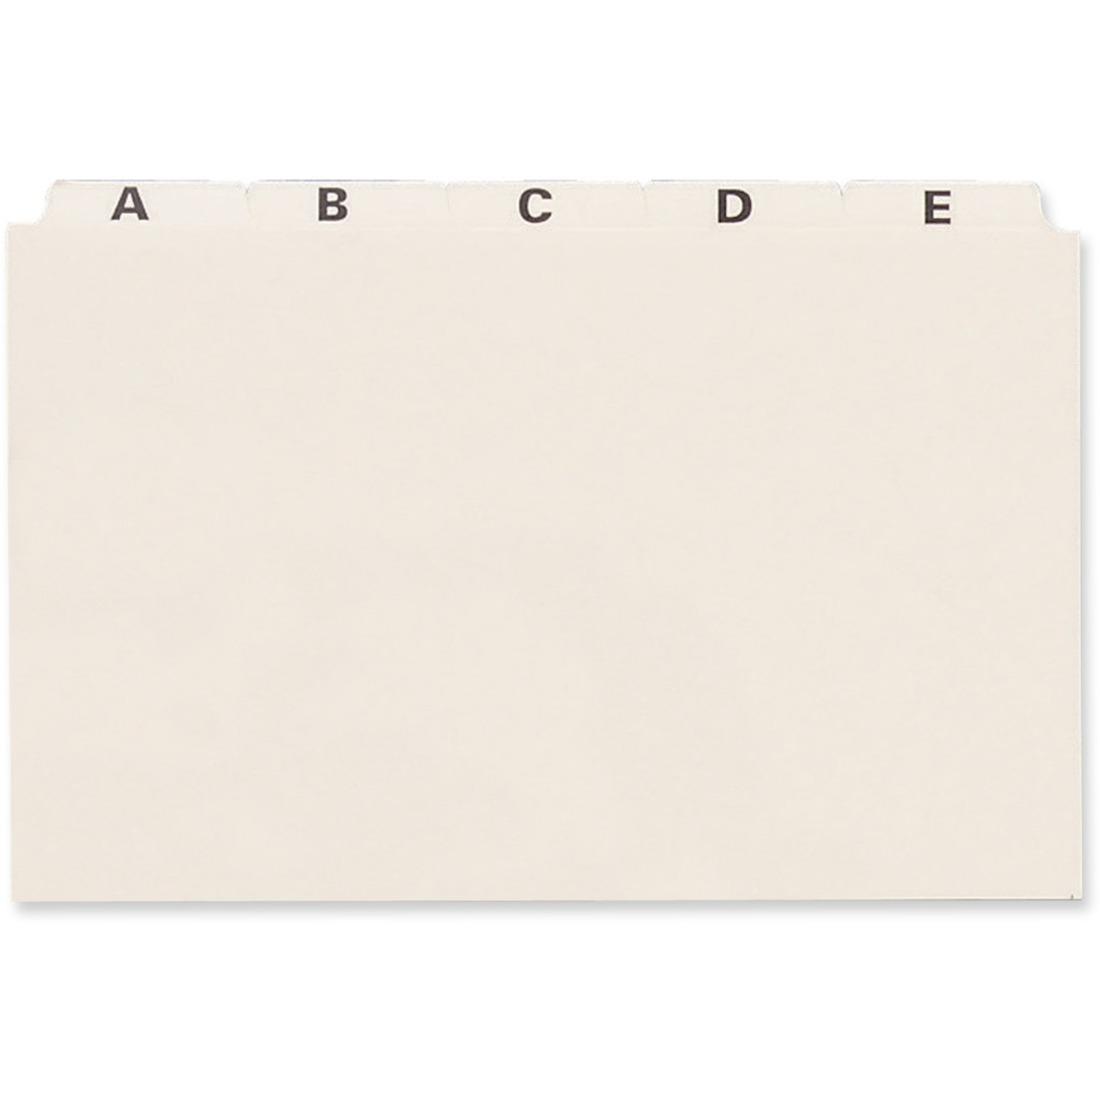 8 x 5 index card holder